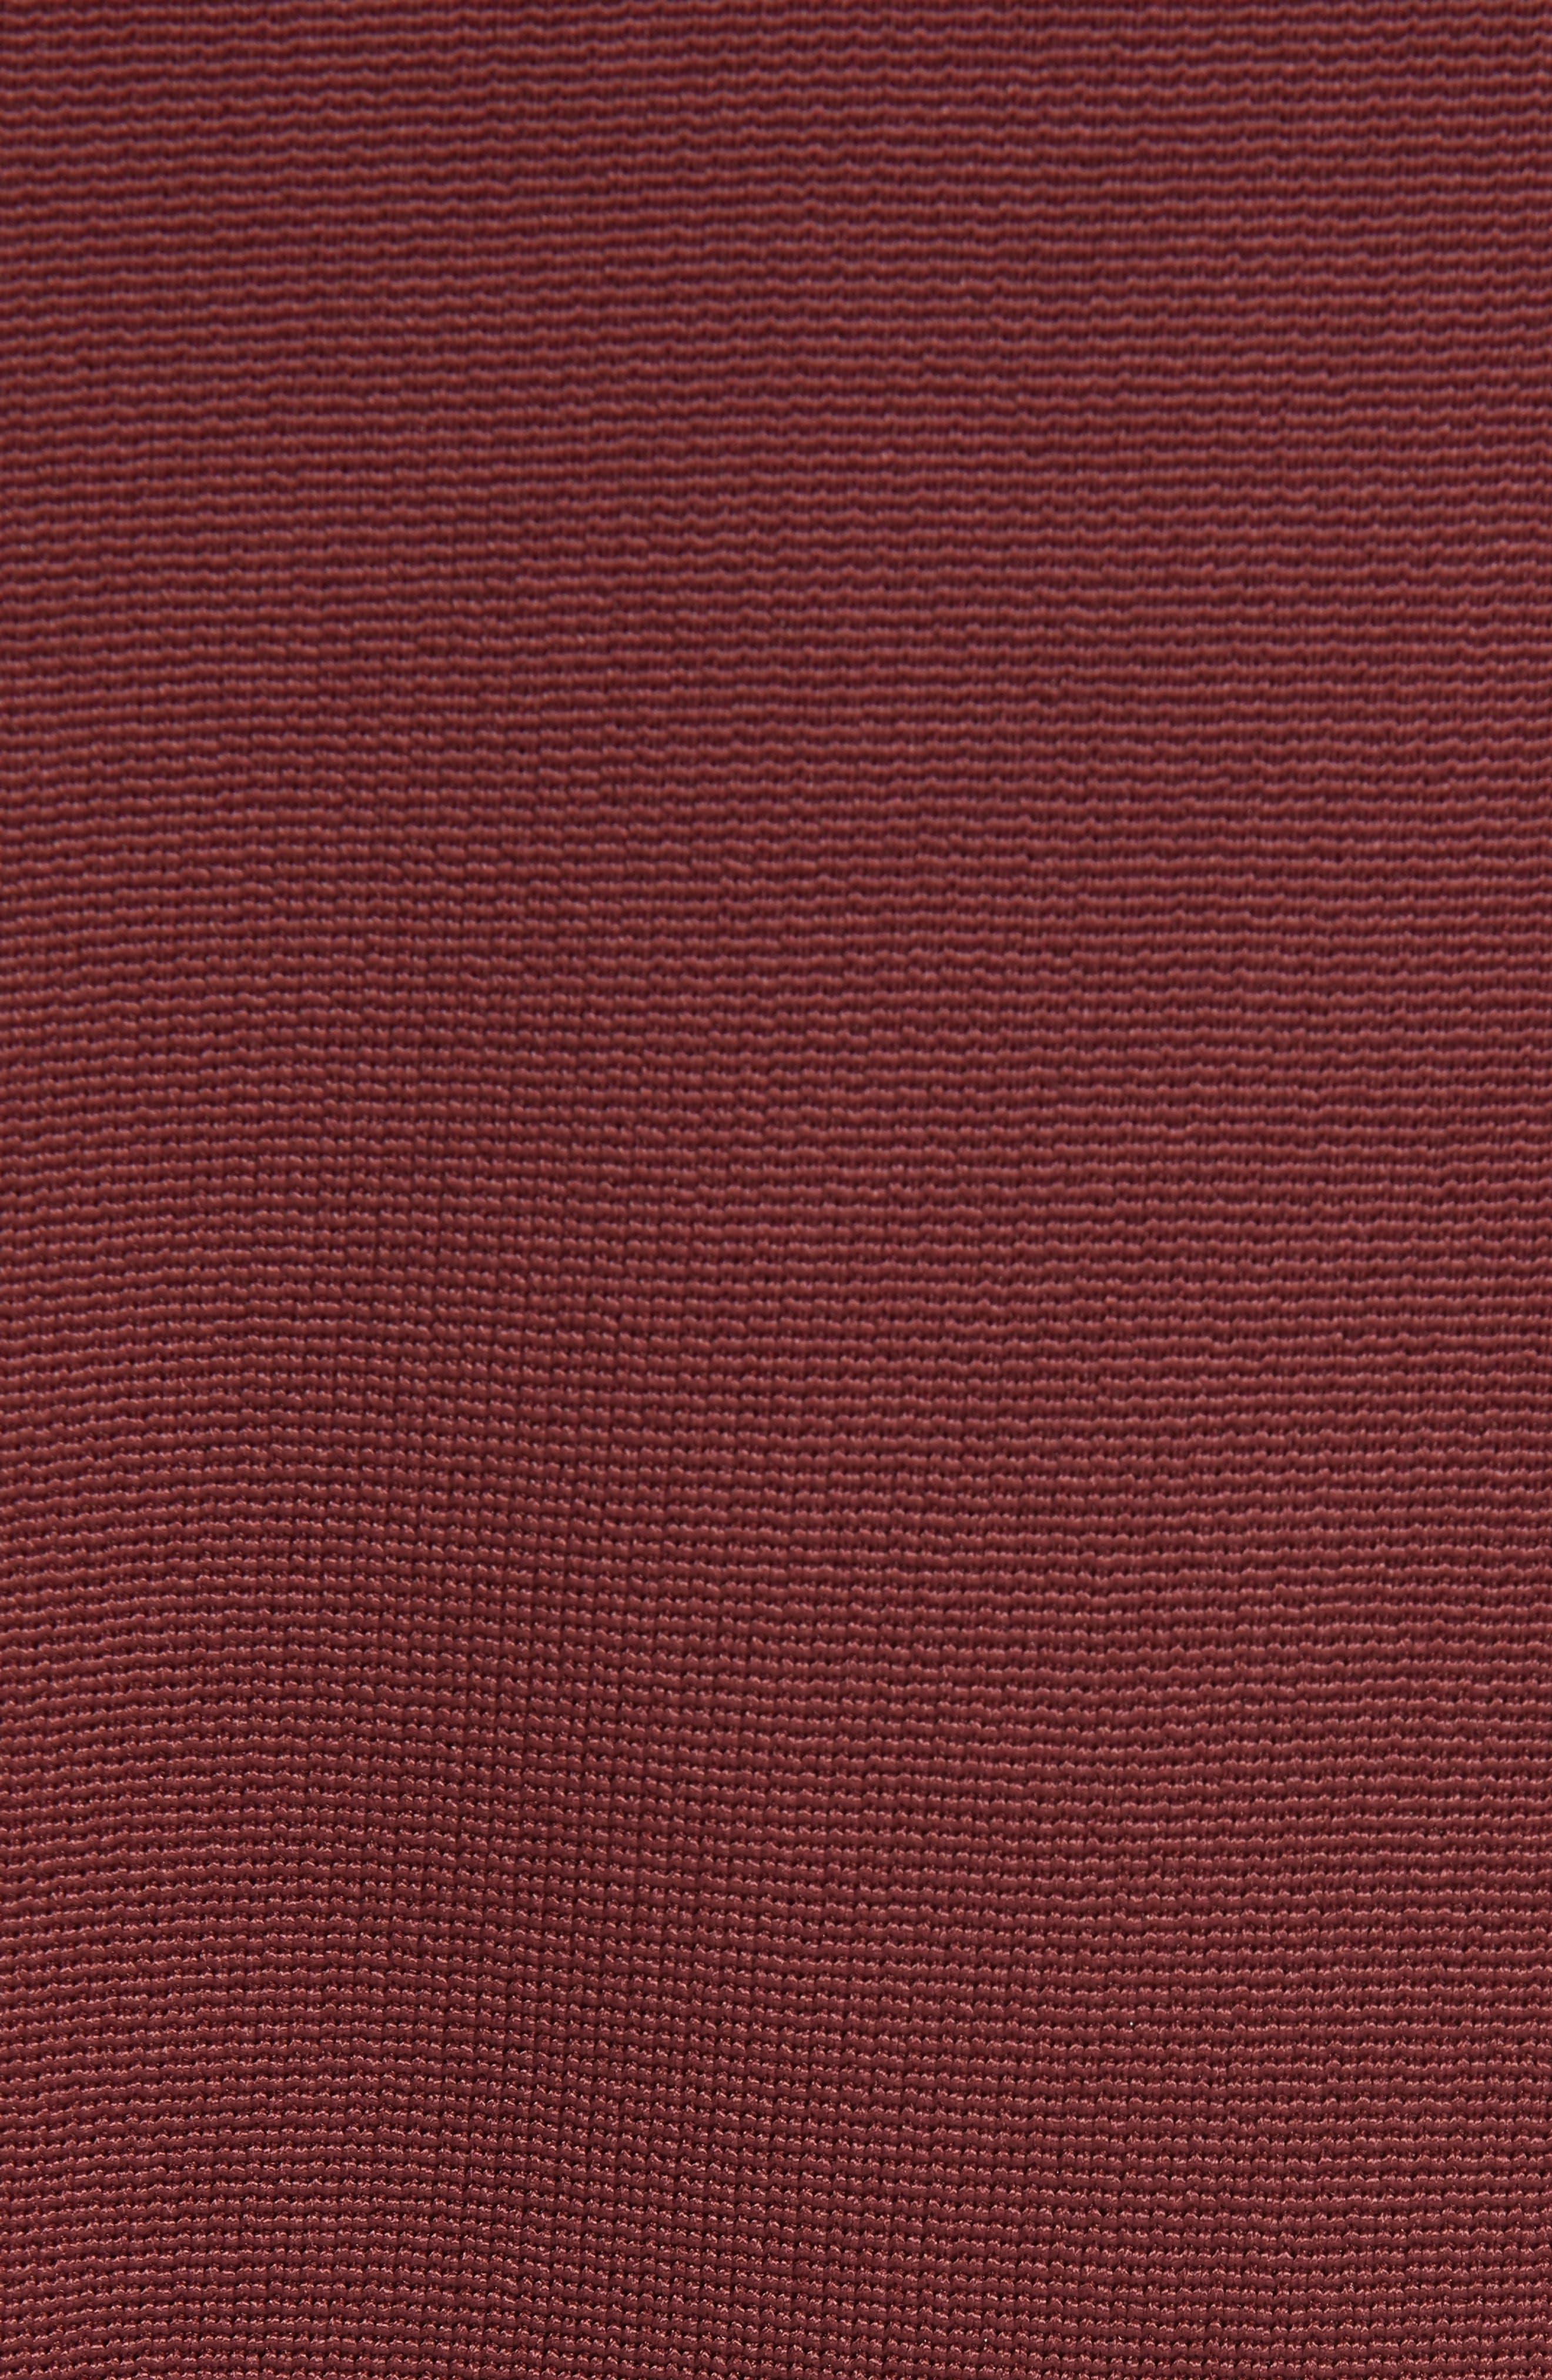 Demiara Sheath Dress,                             Alternate thumbnail 5, color,                             DARK AUBURN